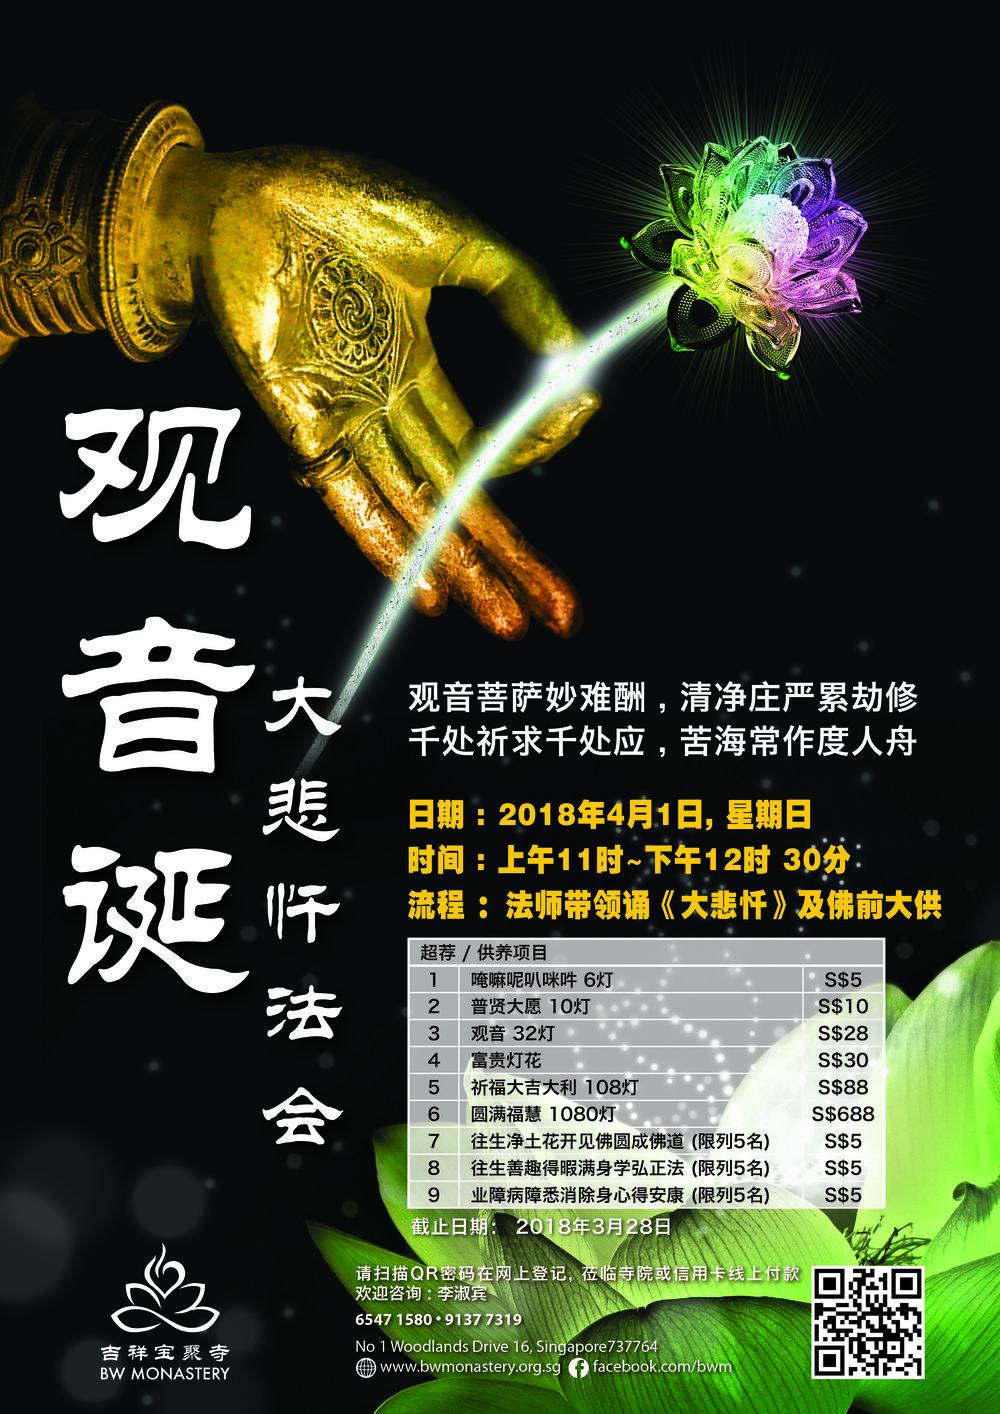 1.观音宝忏Poster (1).jpg